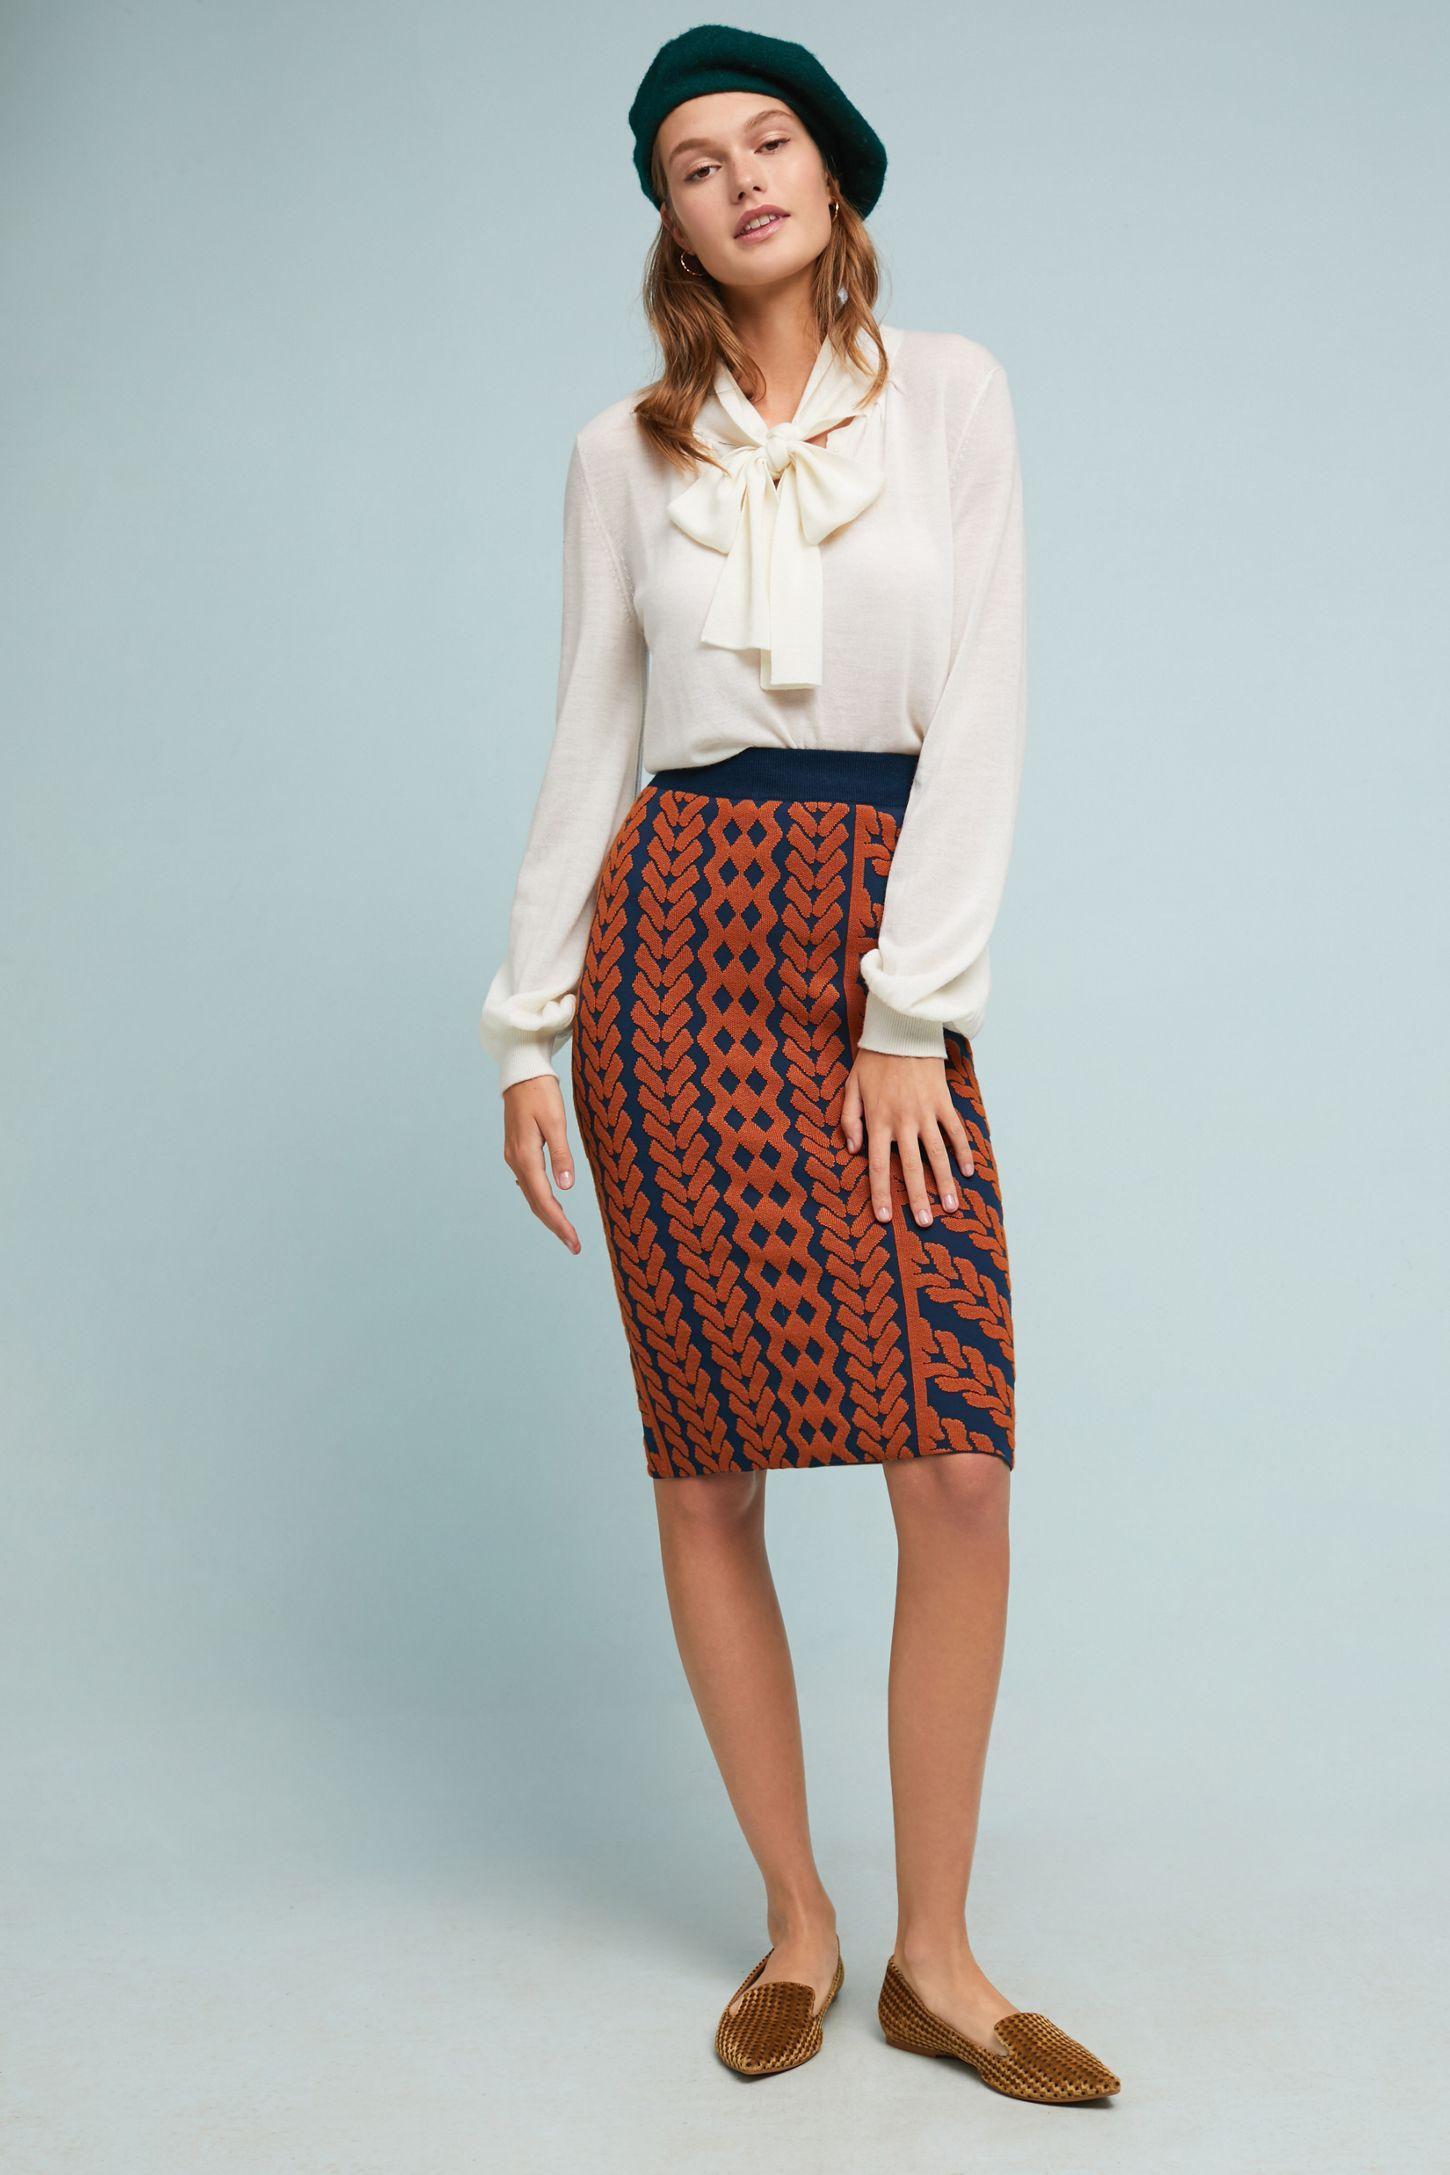 3bacd13a542a5 Geometric Pencil Skirt